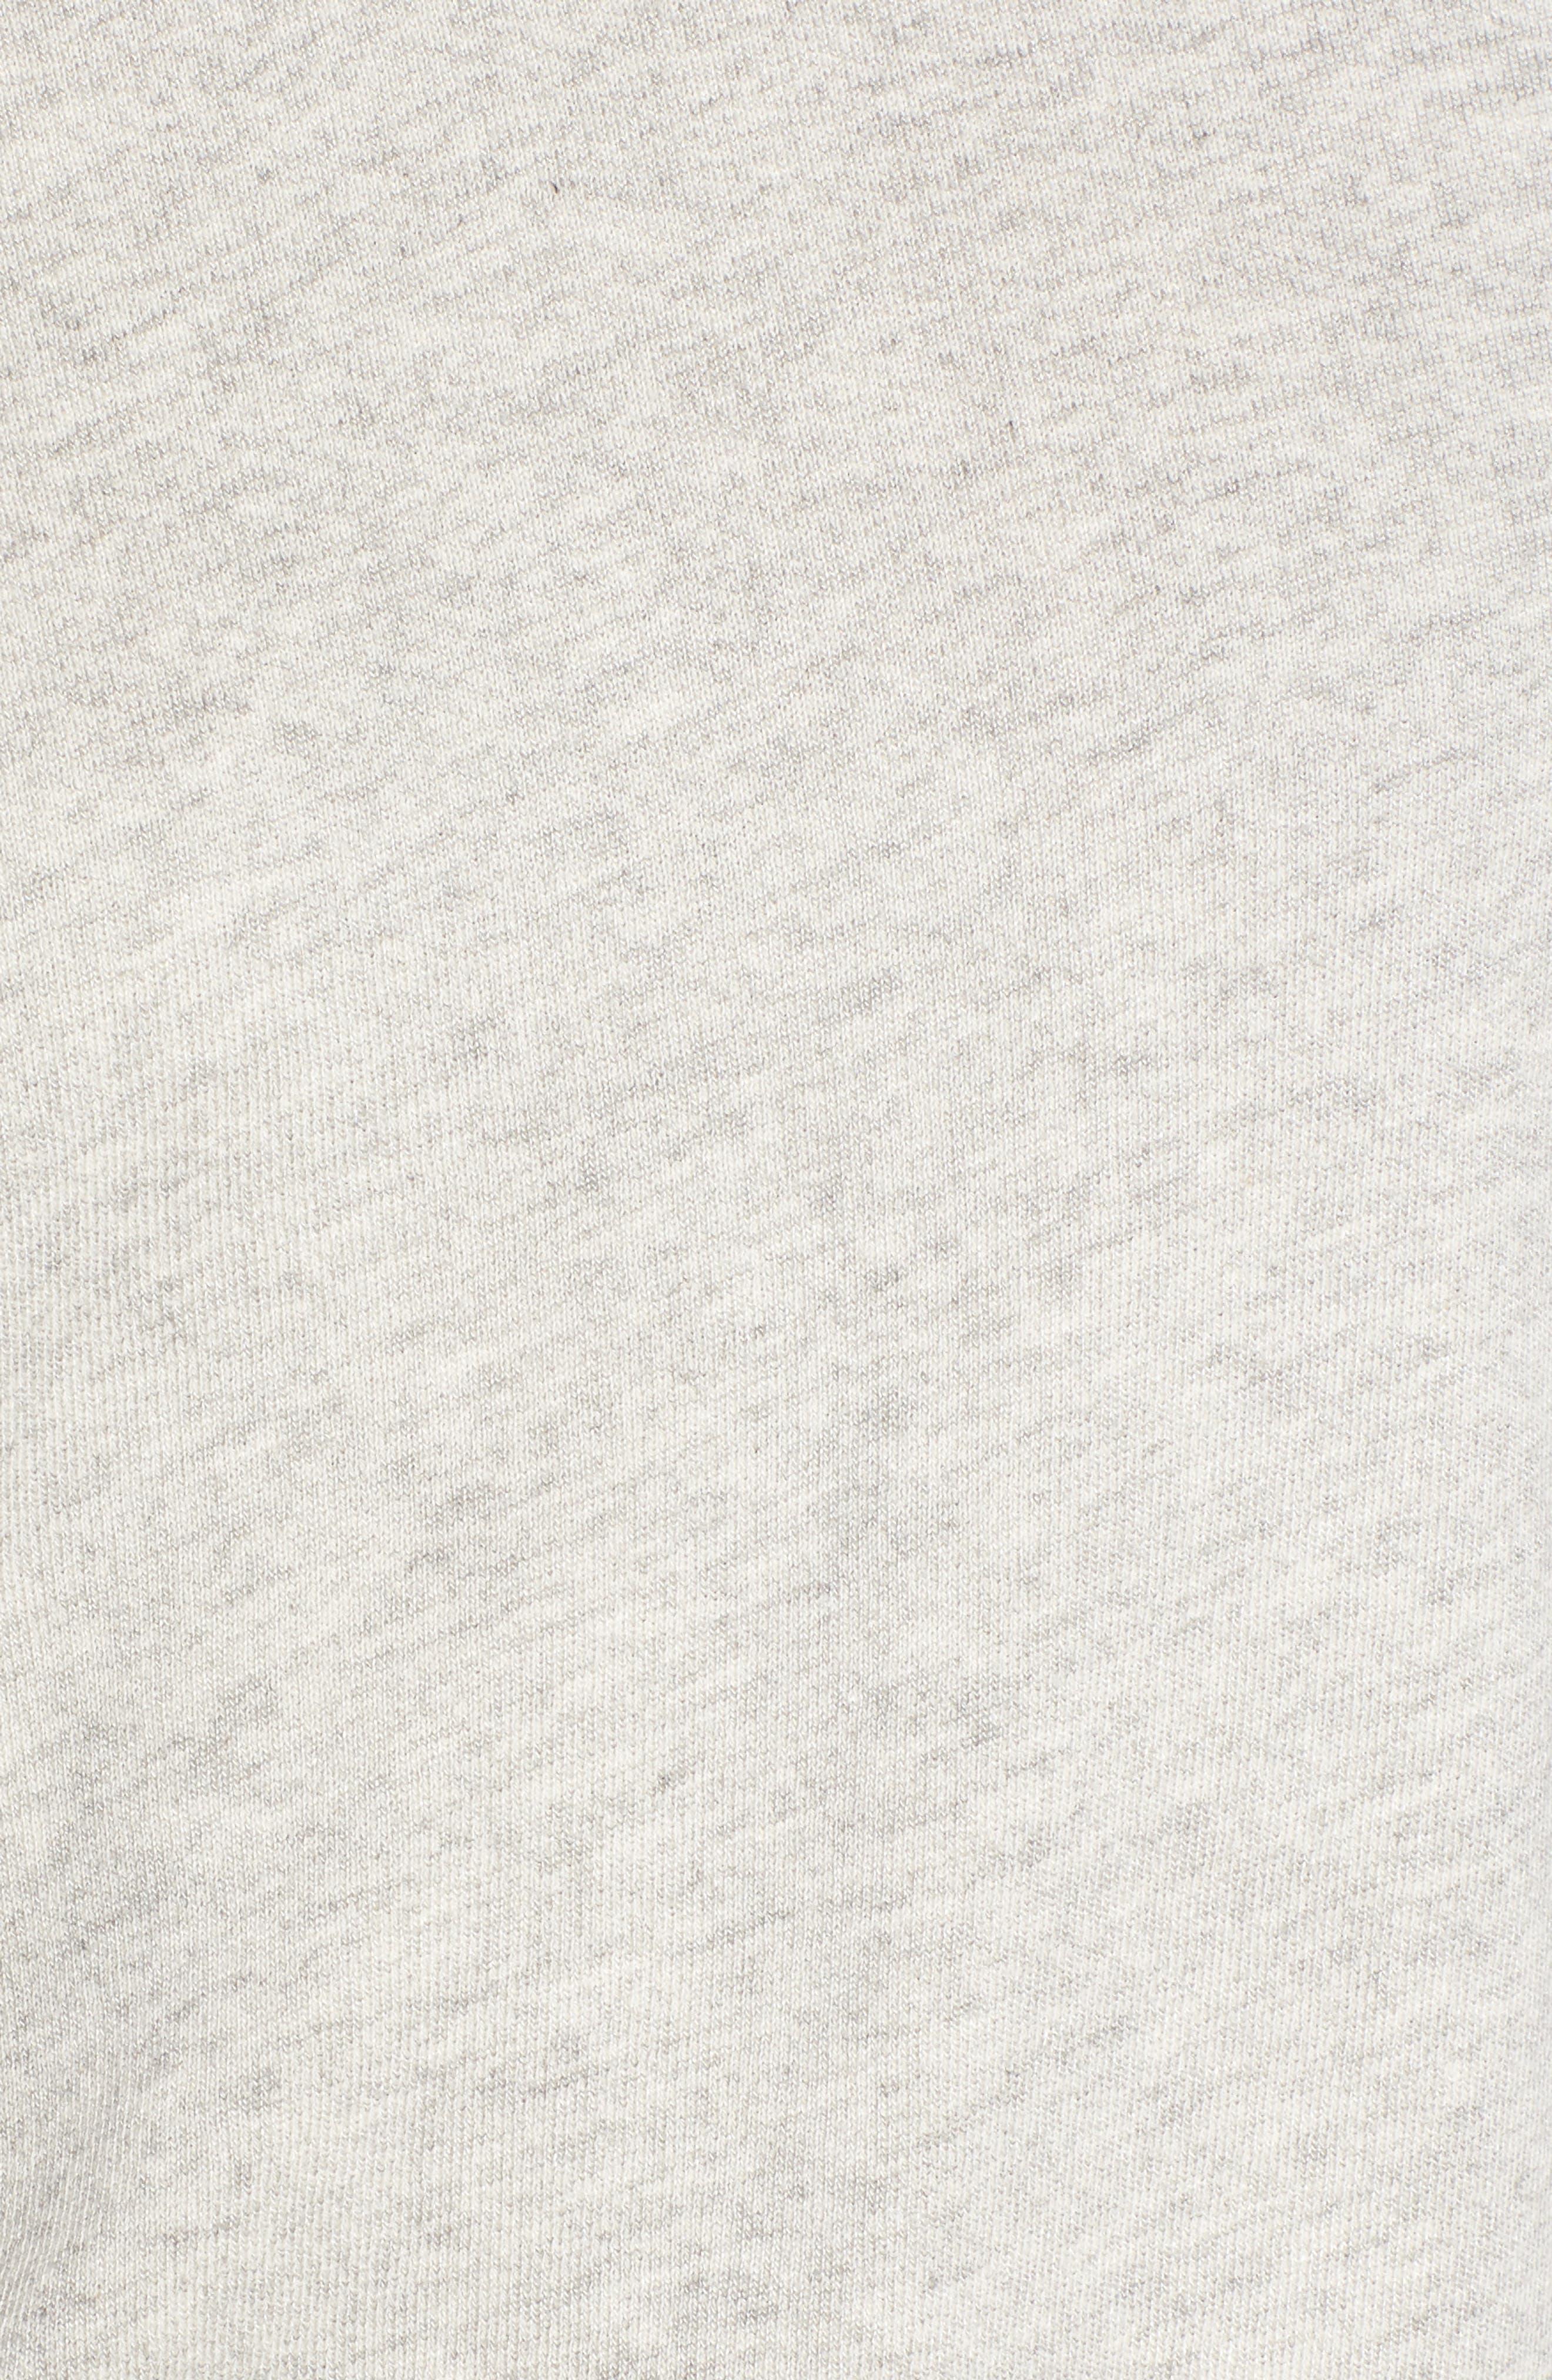 Belize Deconstructed Sweatshirt,                             Alternate thumbnail 5, color,                             030